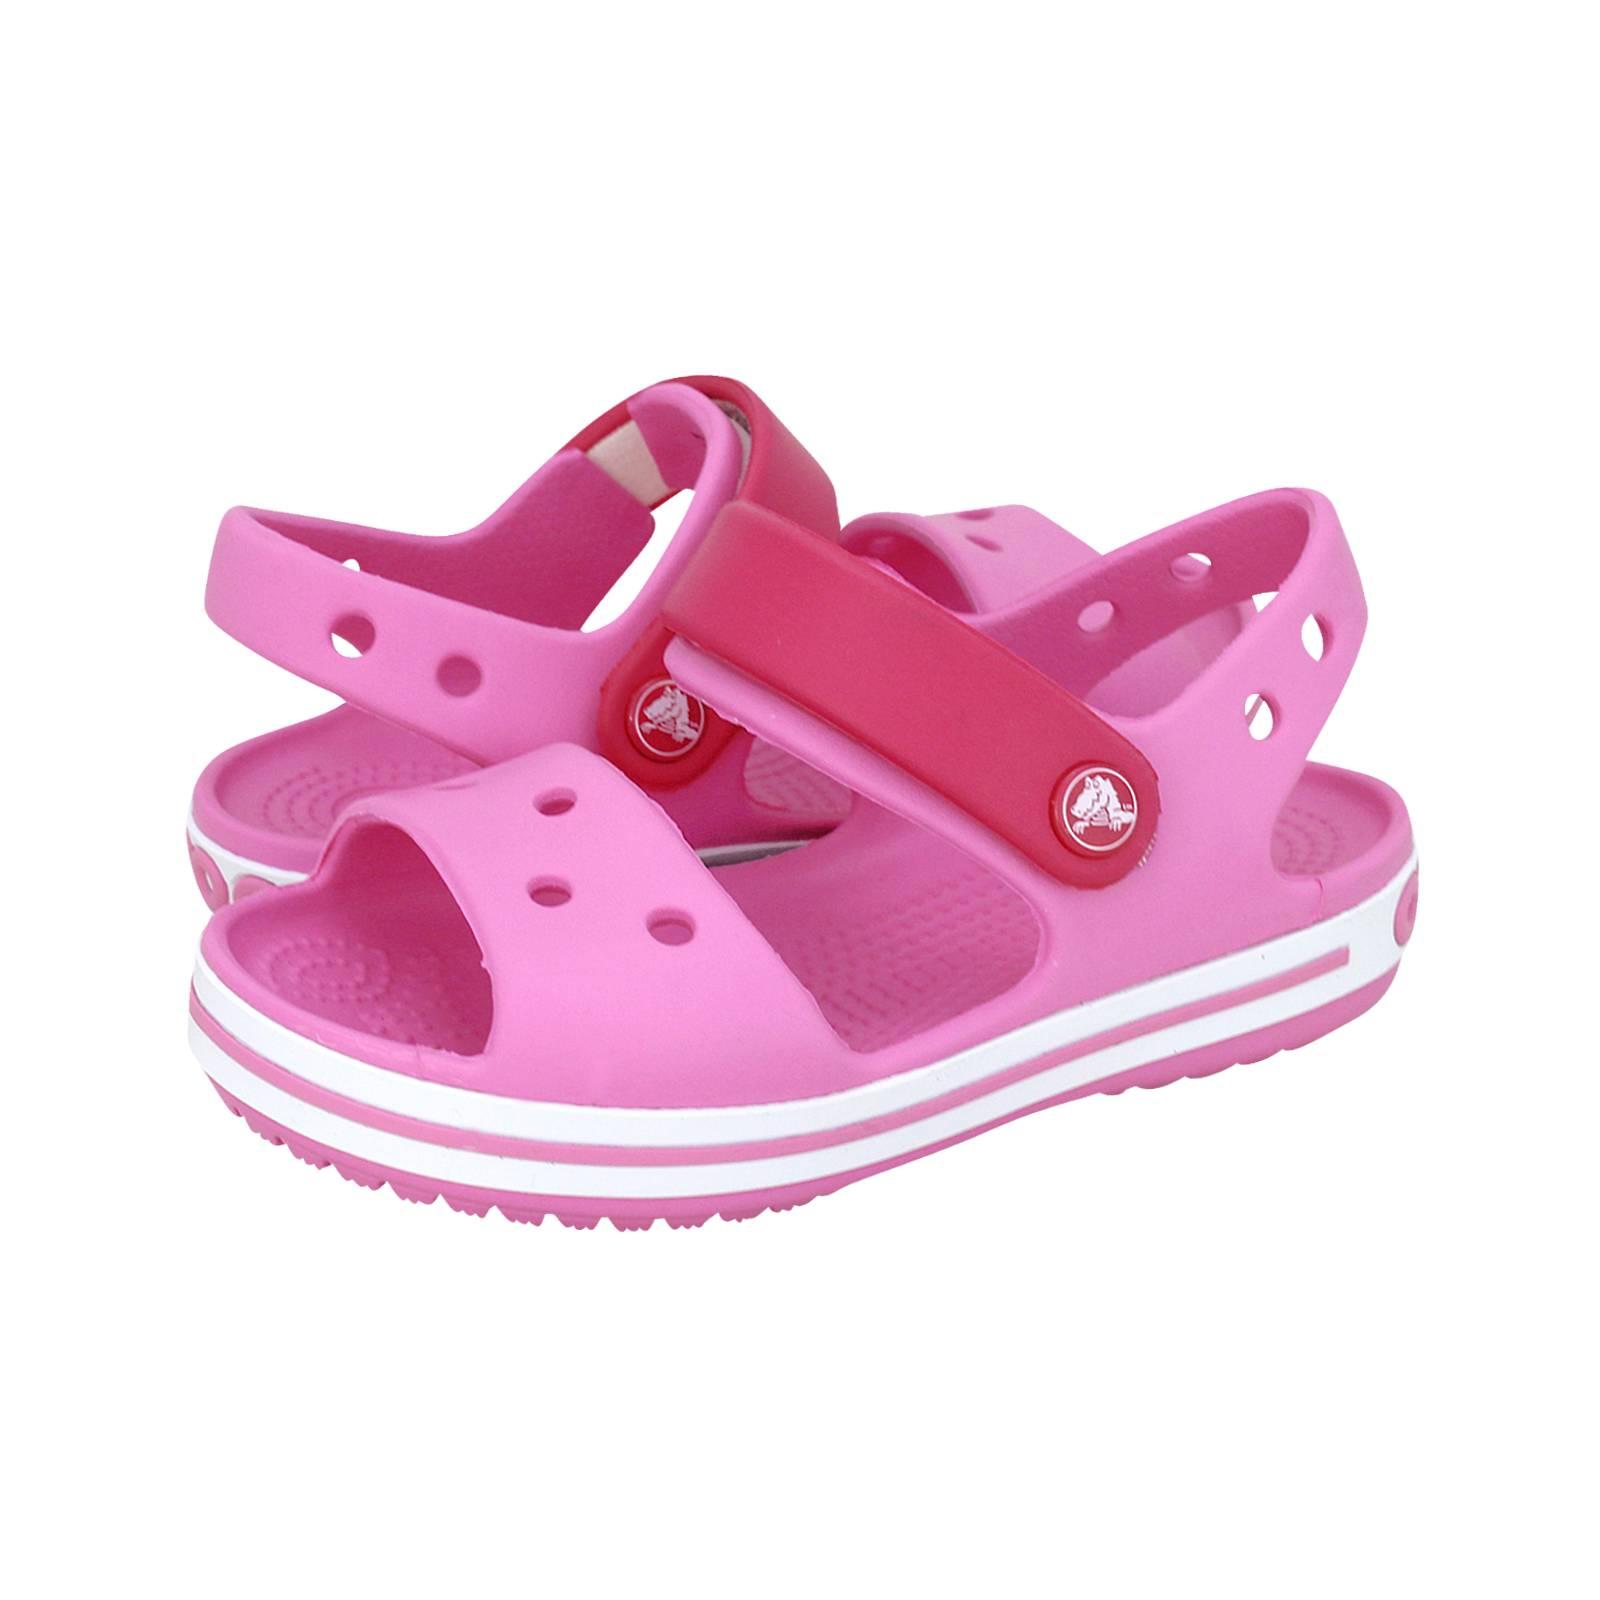 01ff4bb69 Crocband Sandal - Crocs Kids  sandals made of croslite - Gianna ...